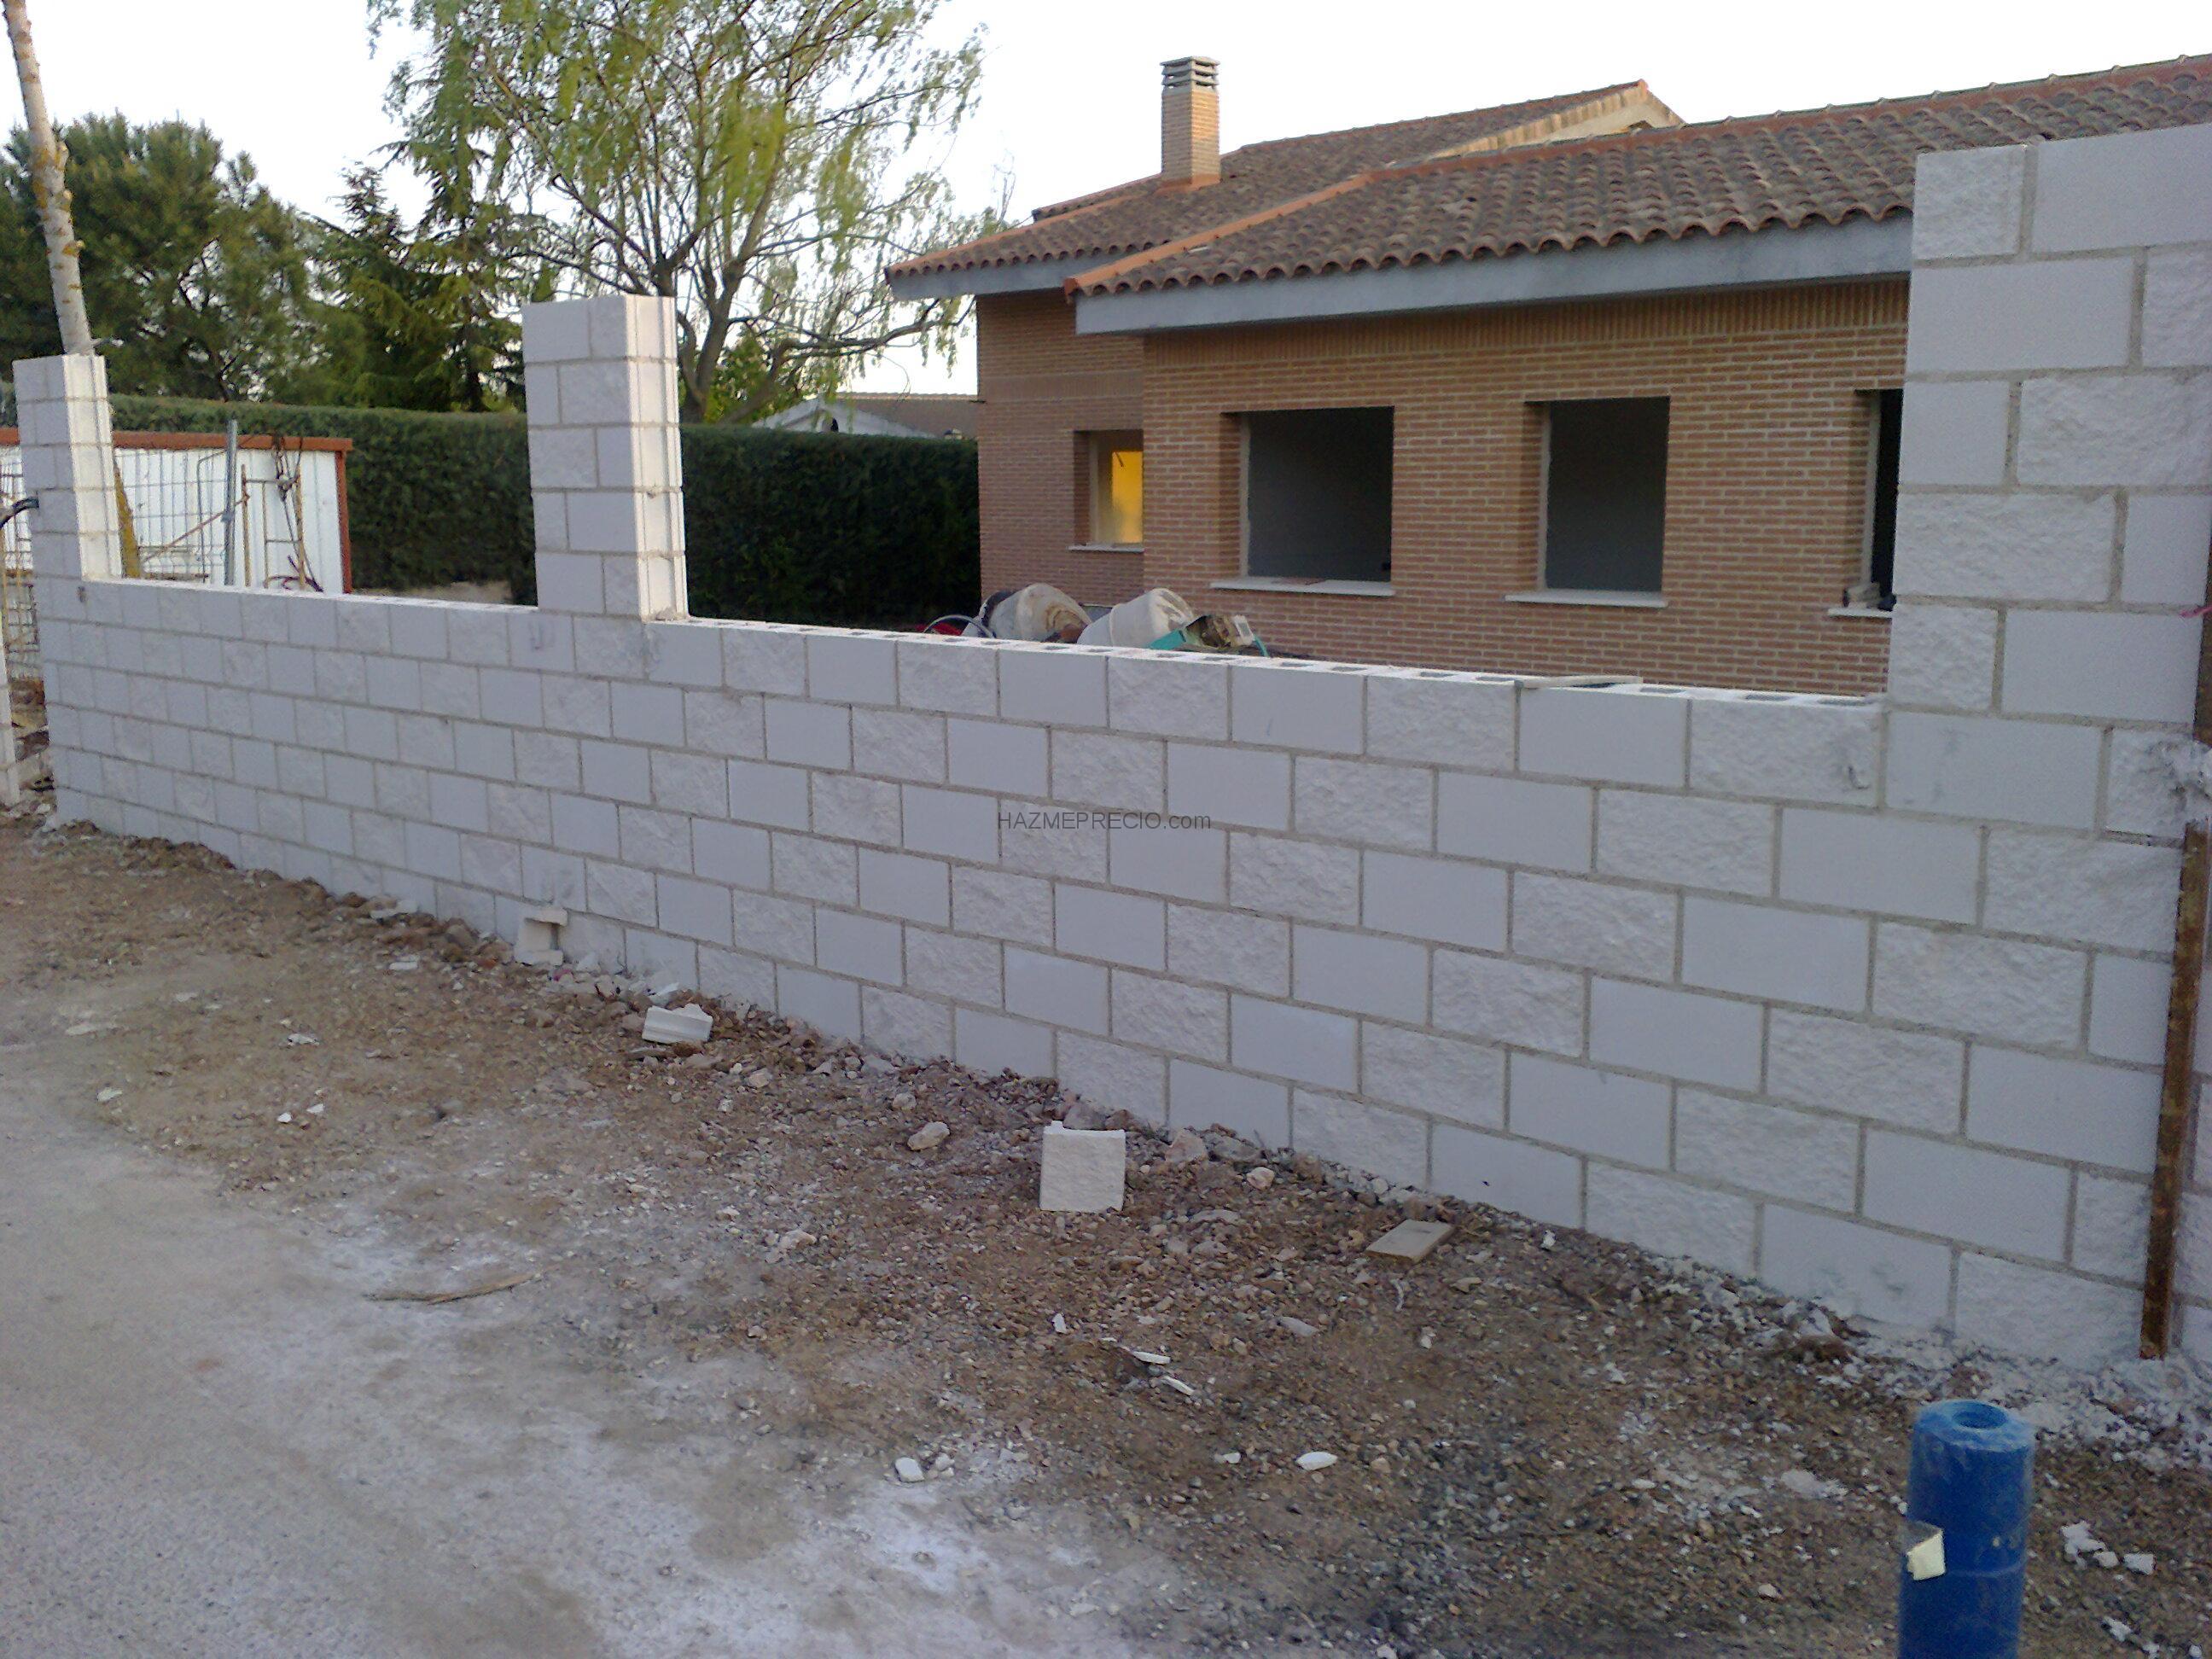 Reformas sella2 28032 madrid madrid - Muro de bloques ...